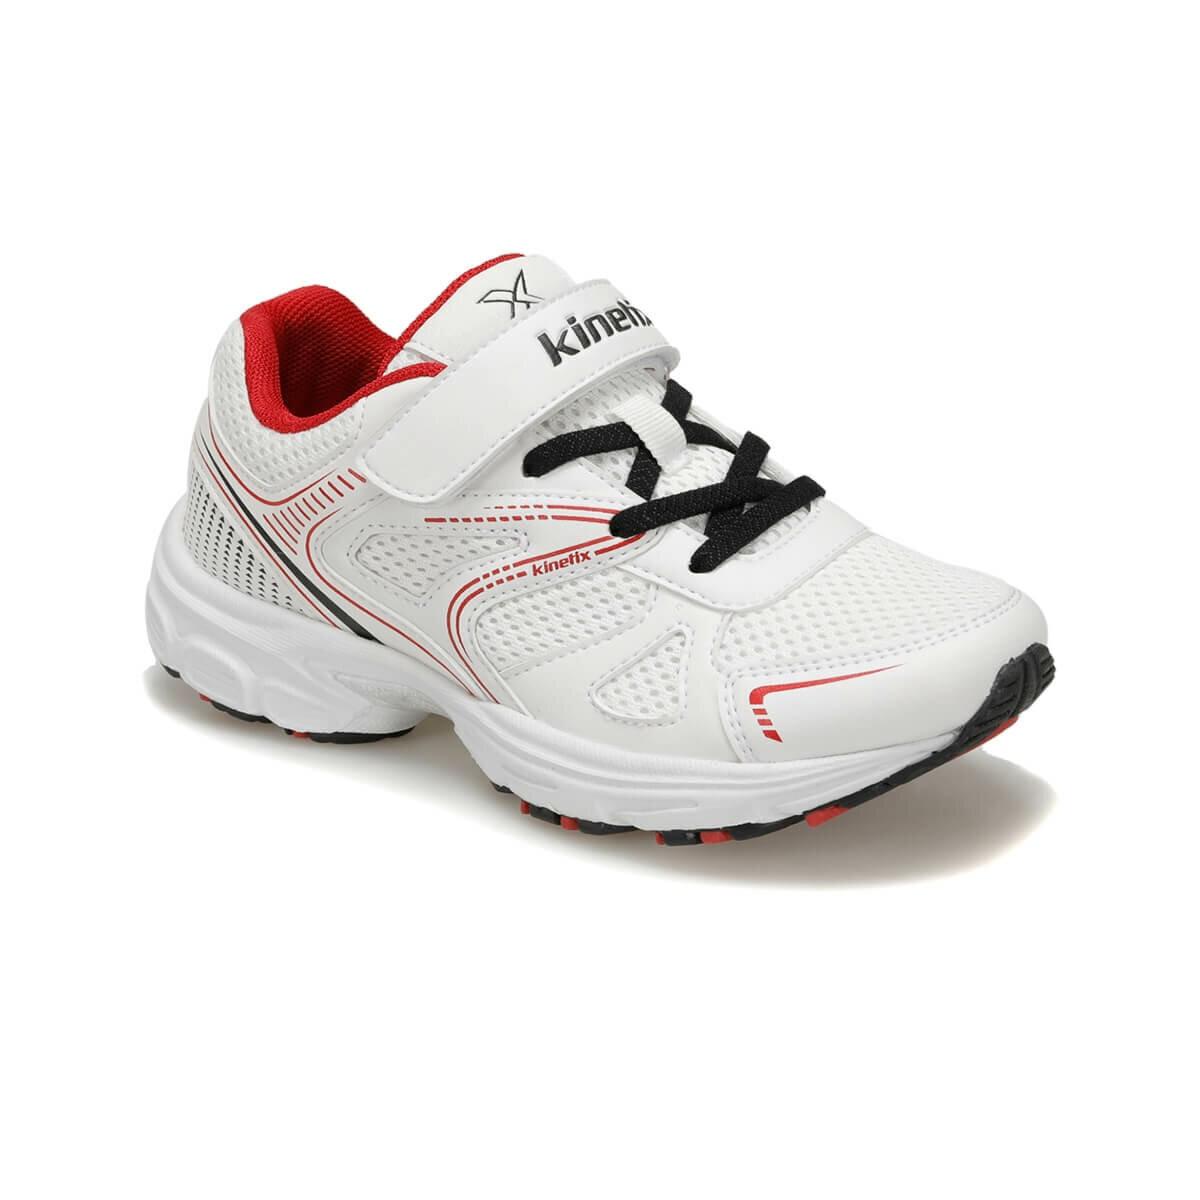 FLO REMOV White Male Child Running Shoes KINETIX